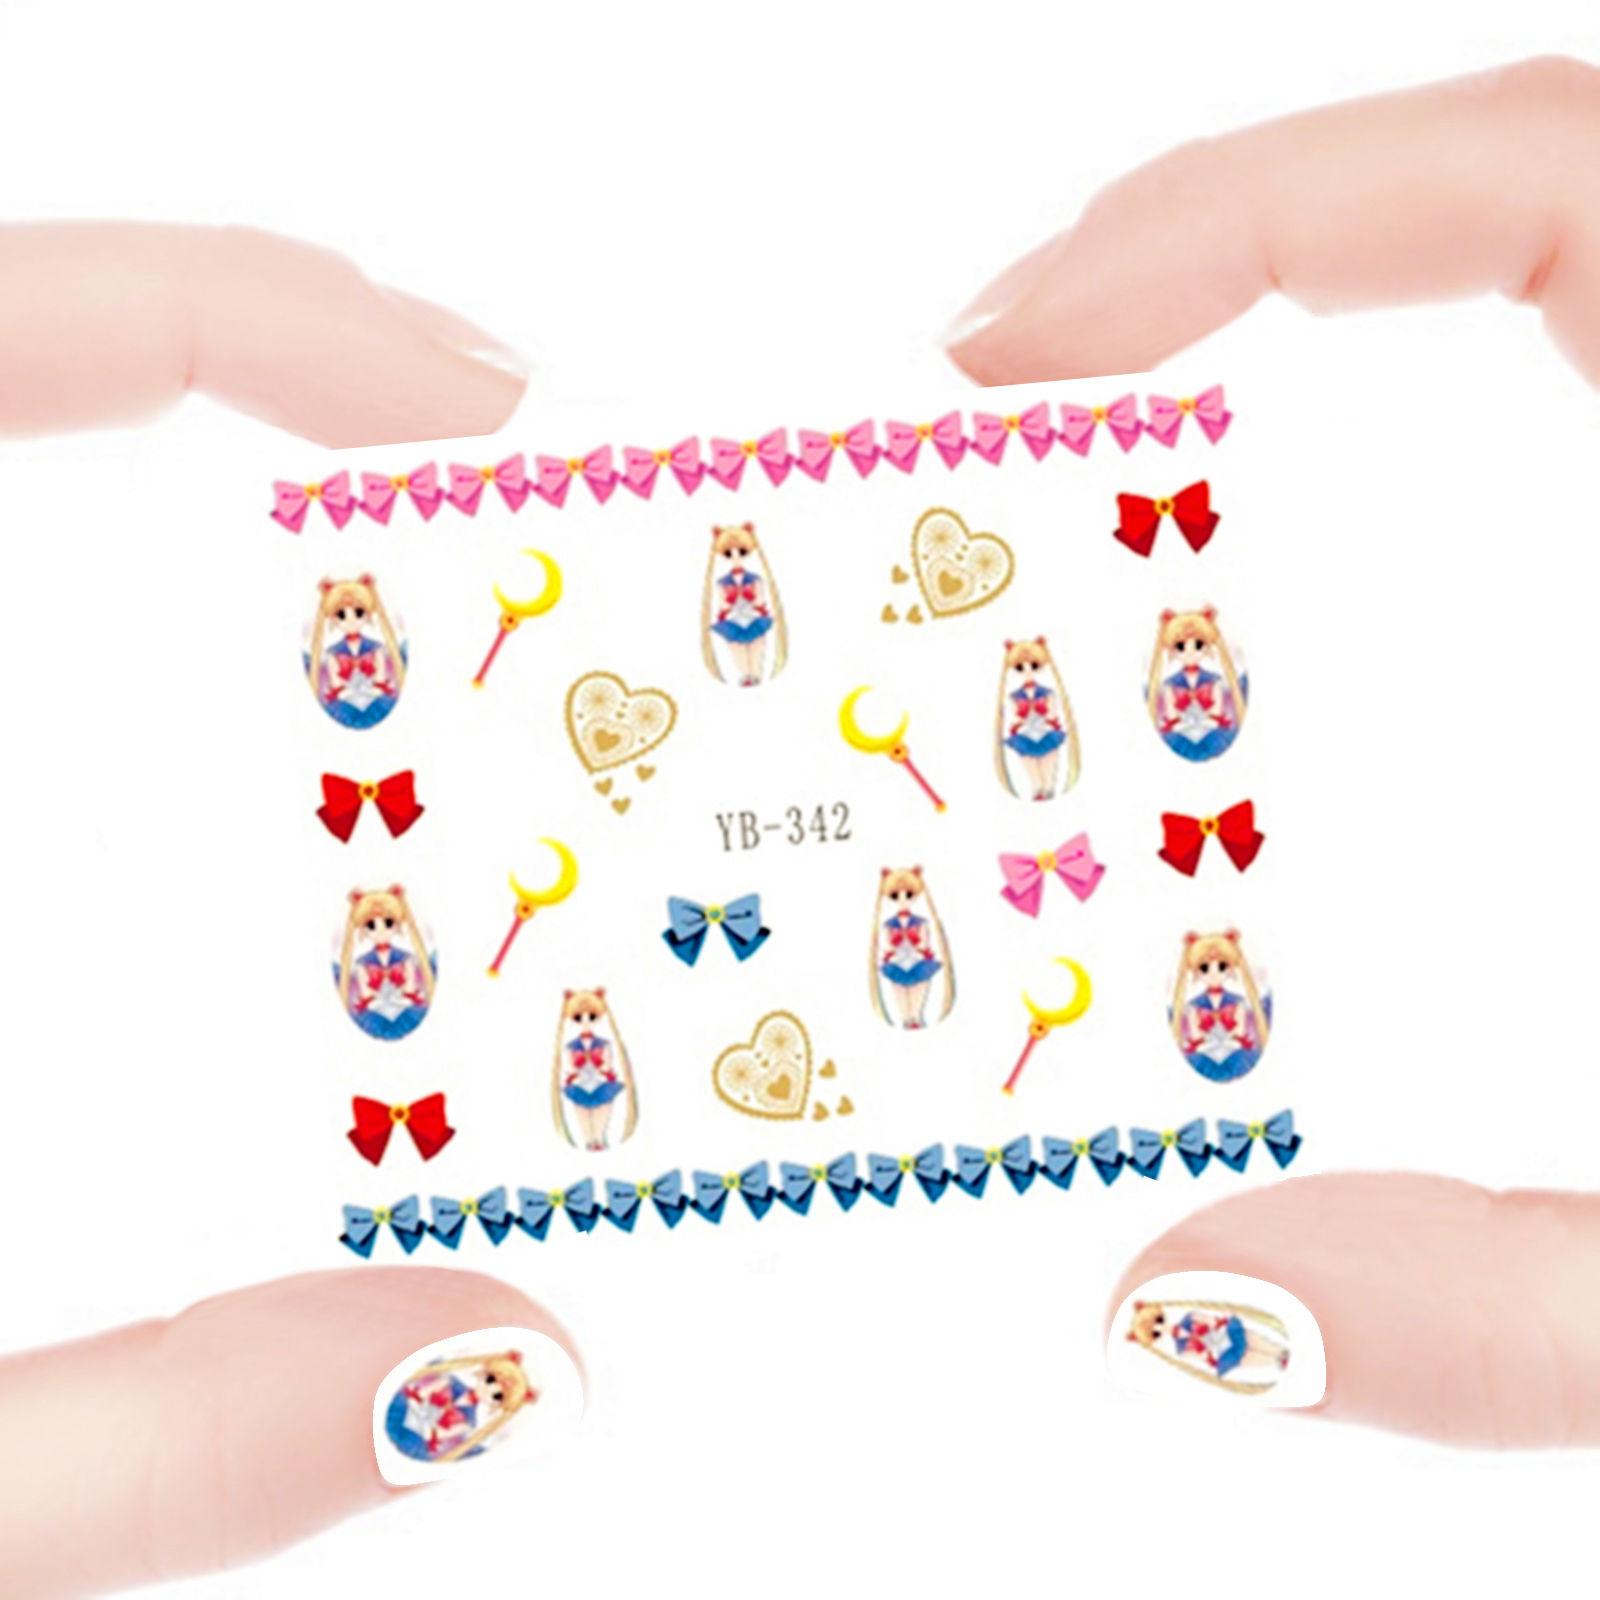 Sailor Moon Nail Art Sticker Decals Water Transfer ♥ DorkyDame ...